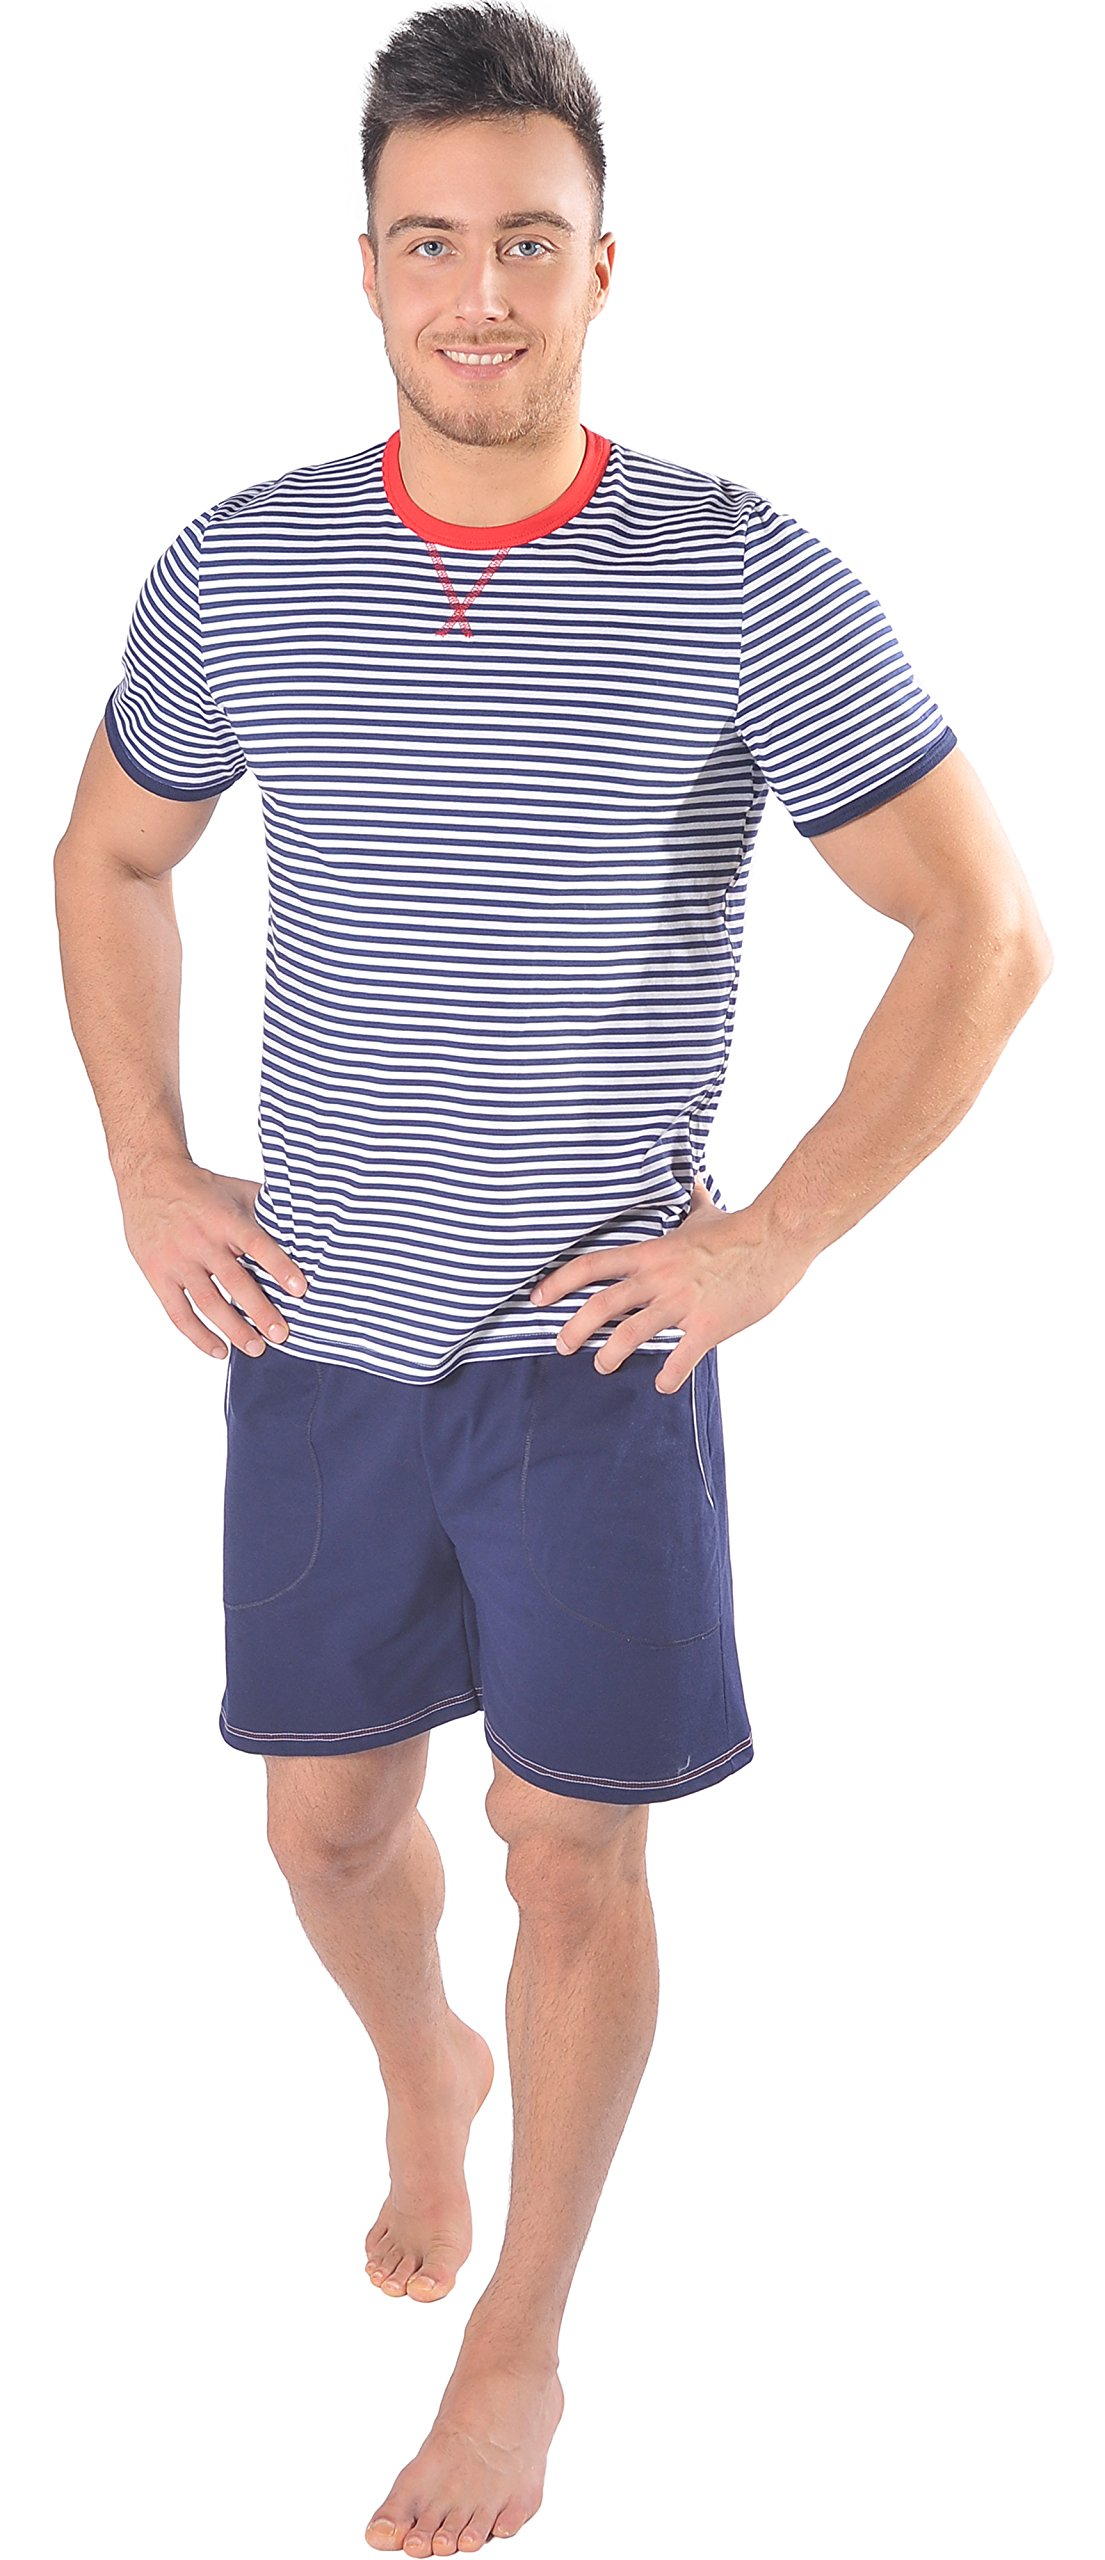 Italian Fashion IF Pijama para hombre 2017v1 0227 product image